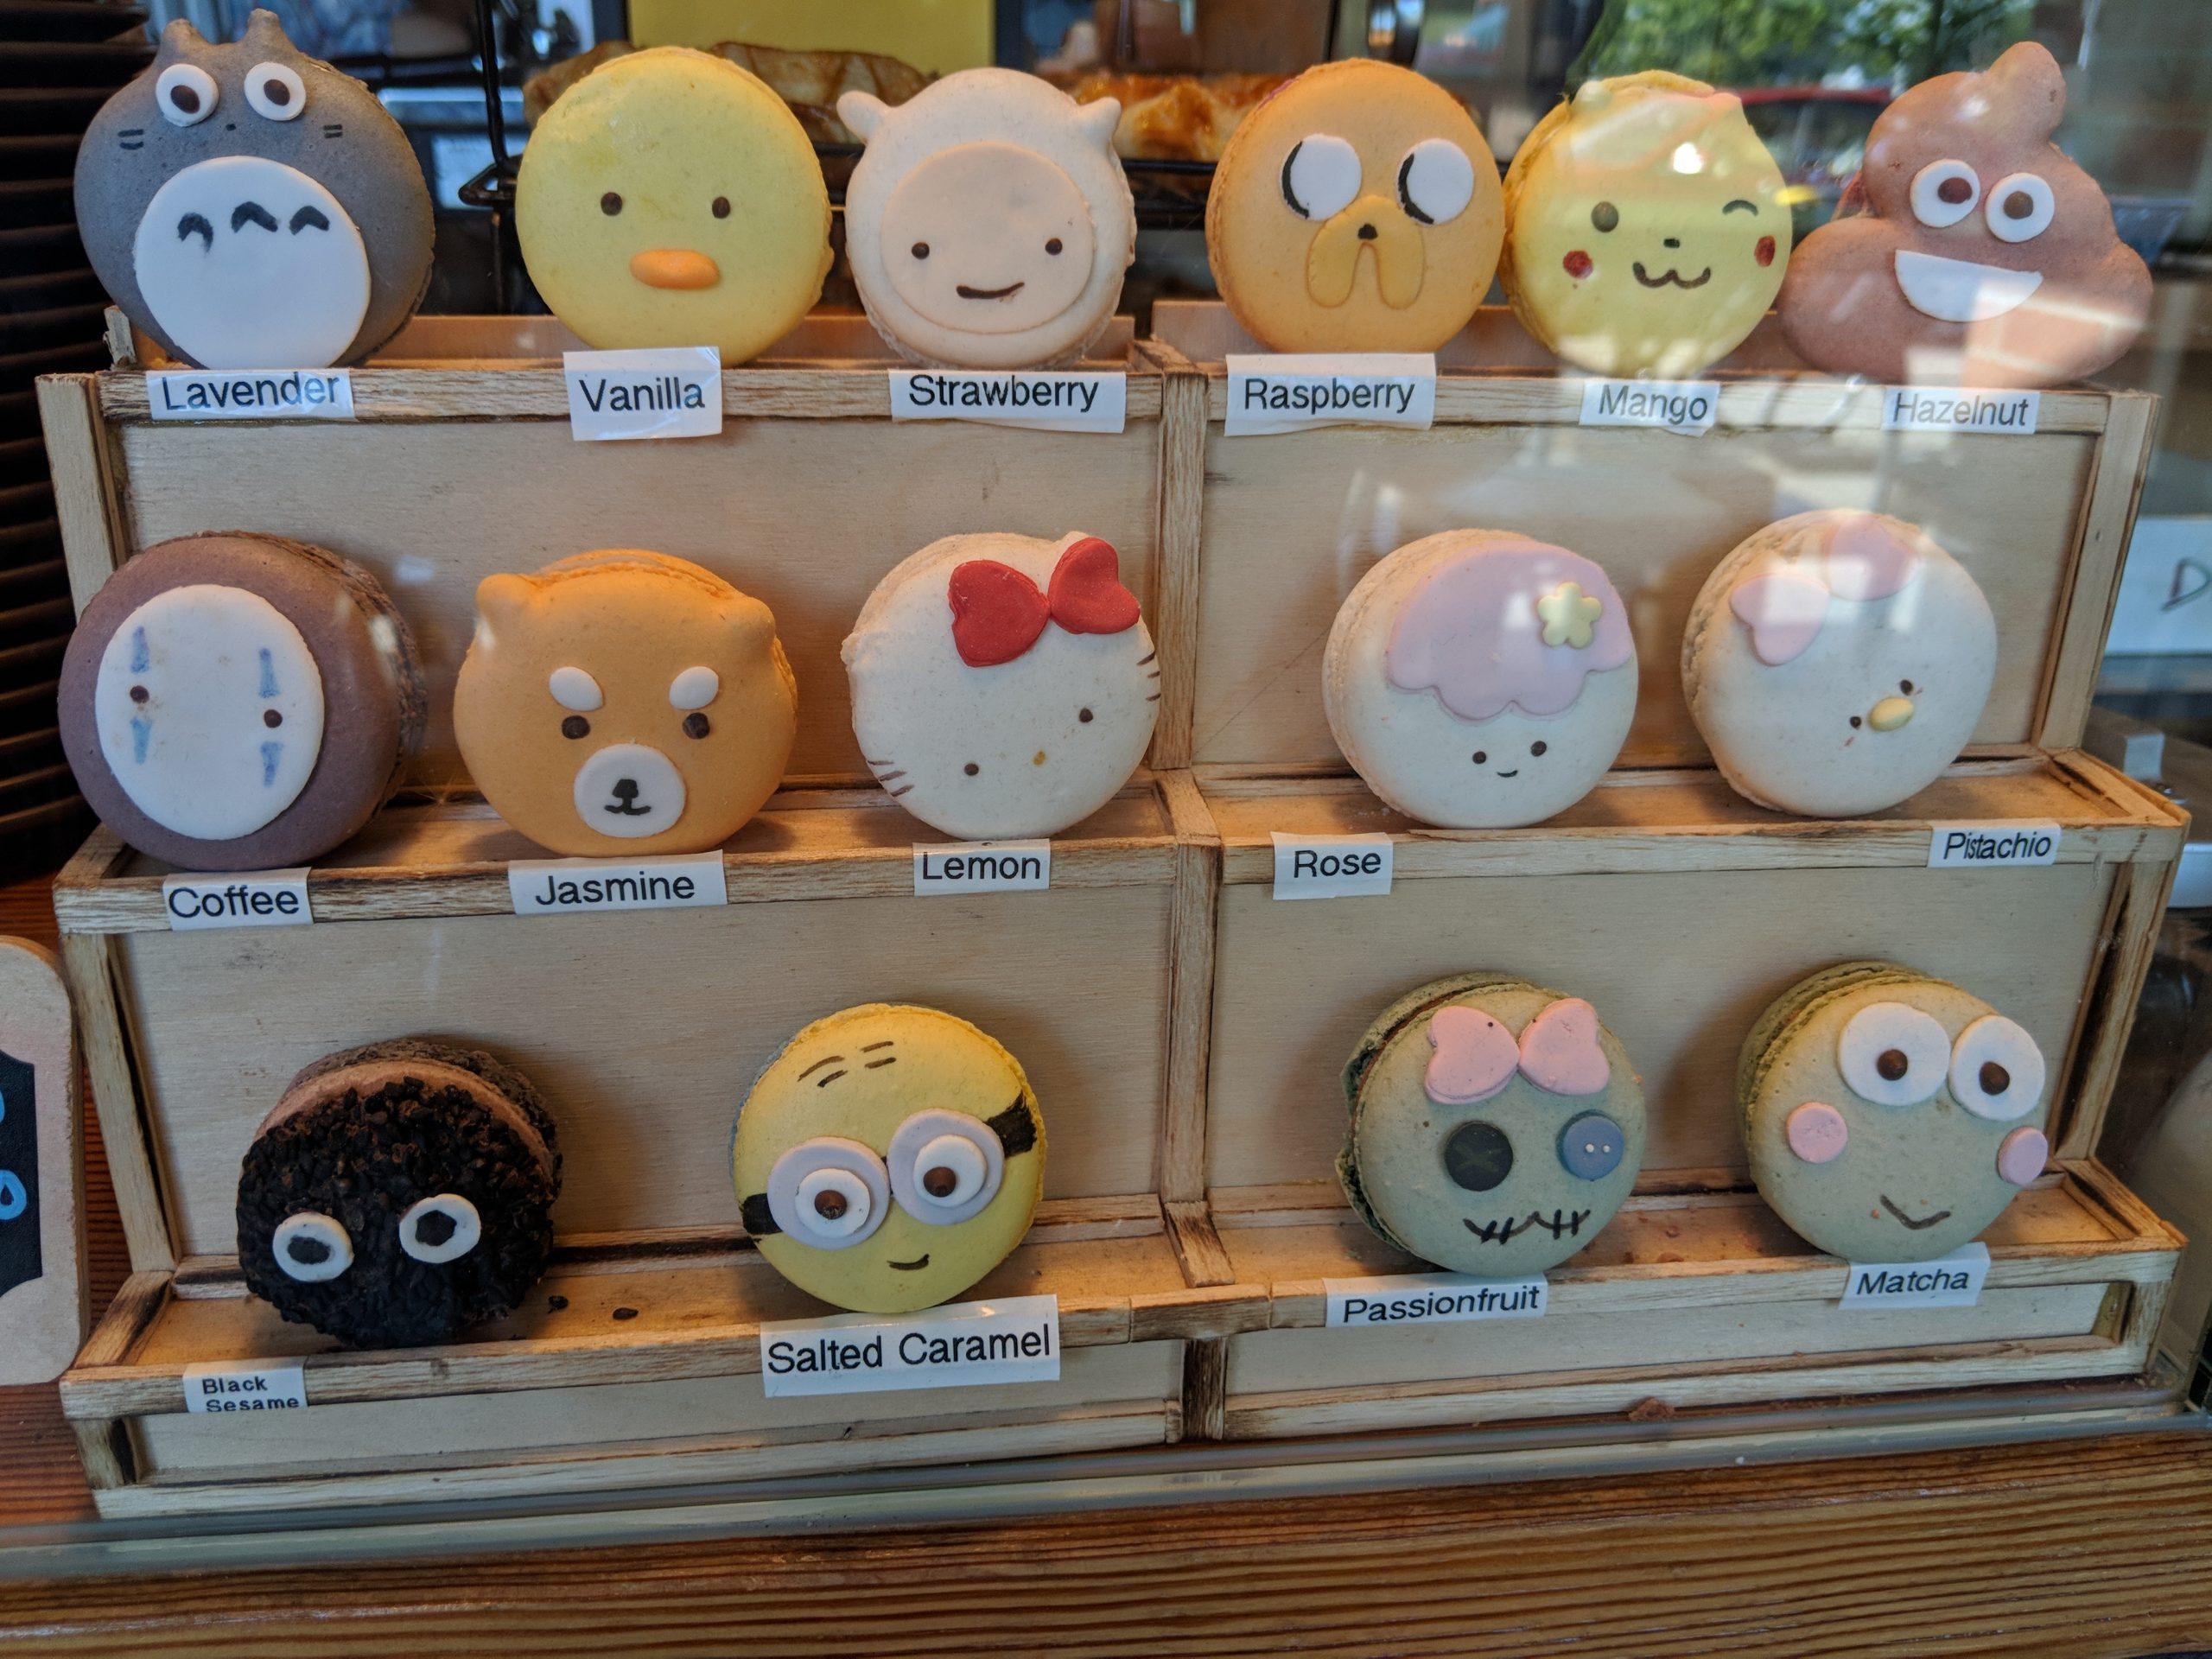 How to Make Designs on Macarons